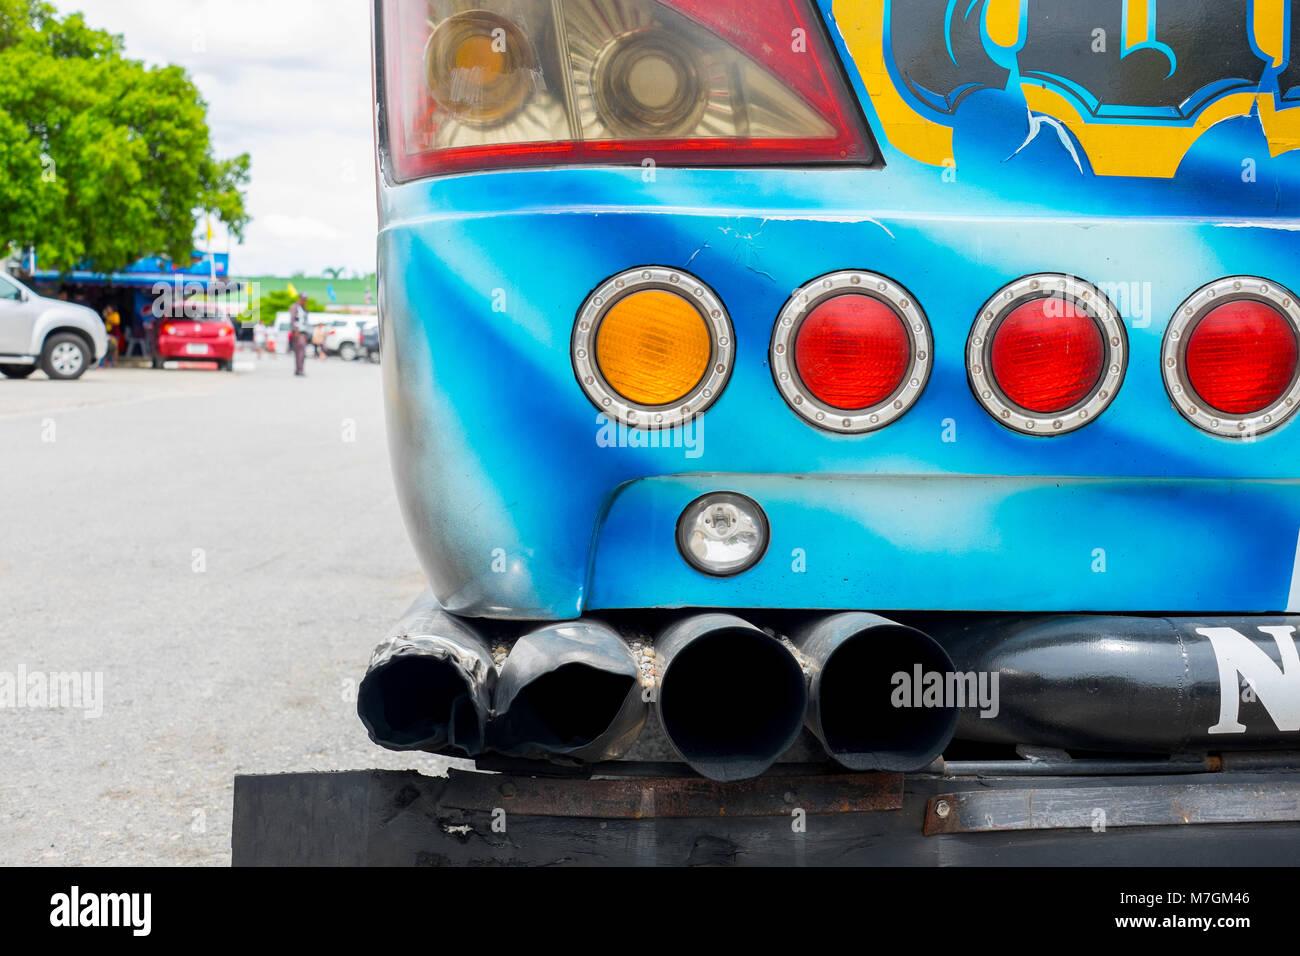 Rear side of tourist coach bus showing exhaust pip, left turn signal light, stop light, break light; backup light; Stock Photo